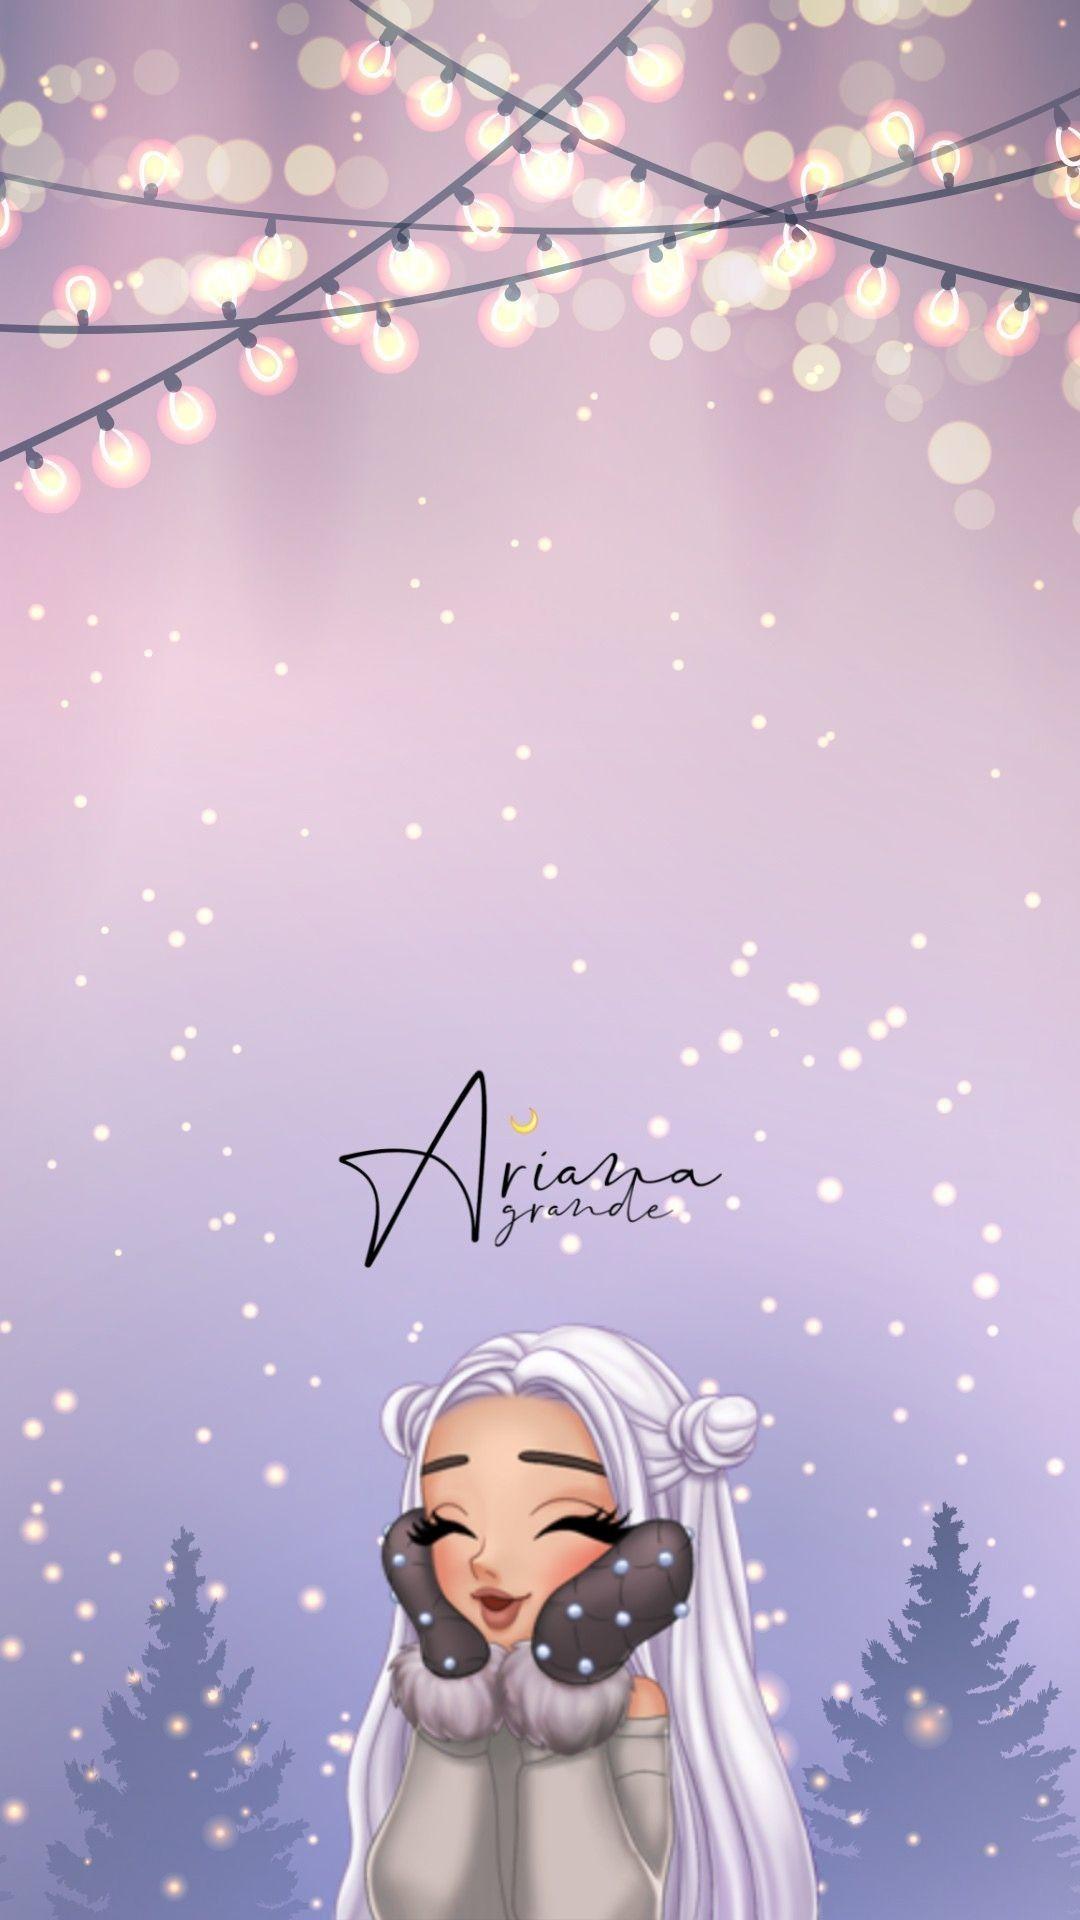 Weihnachten Animation.Pin By Sahar Moeini On 3d In 2019 Ariana Grande Ariana Grande